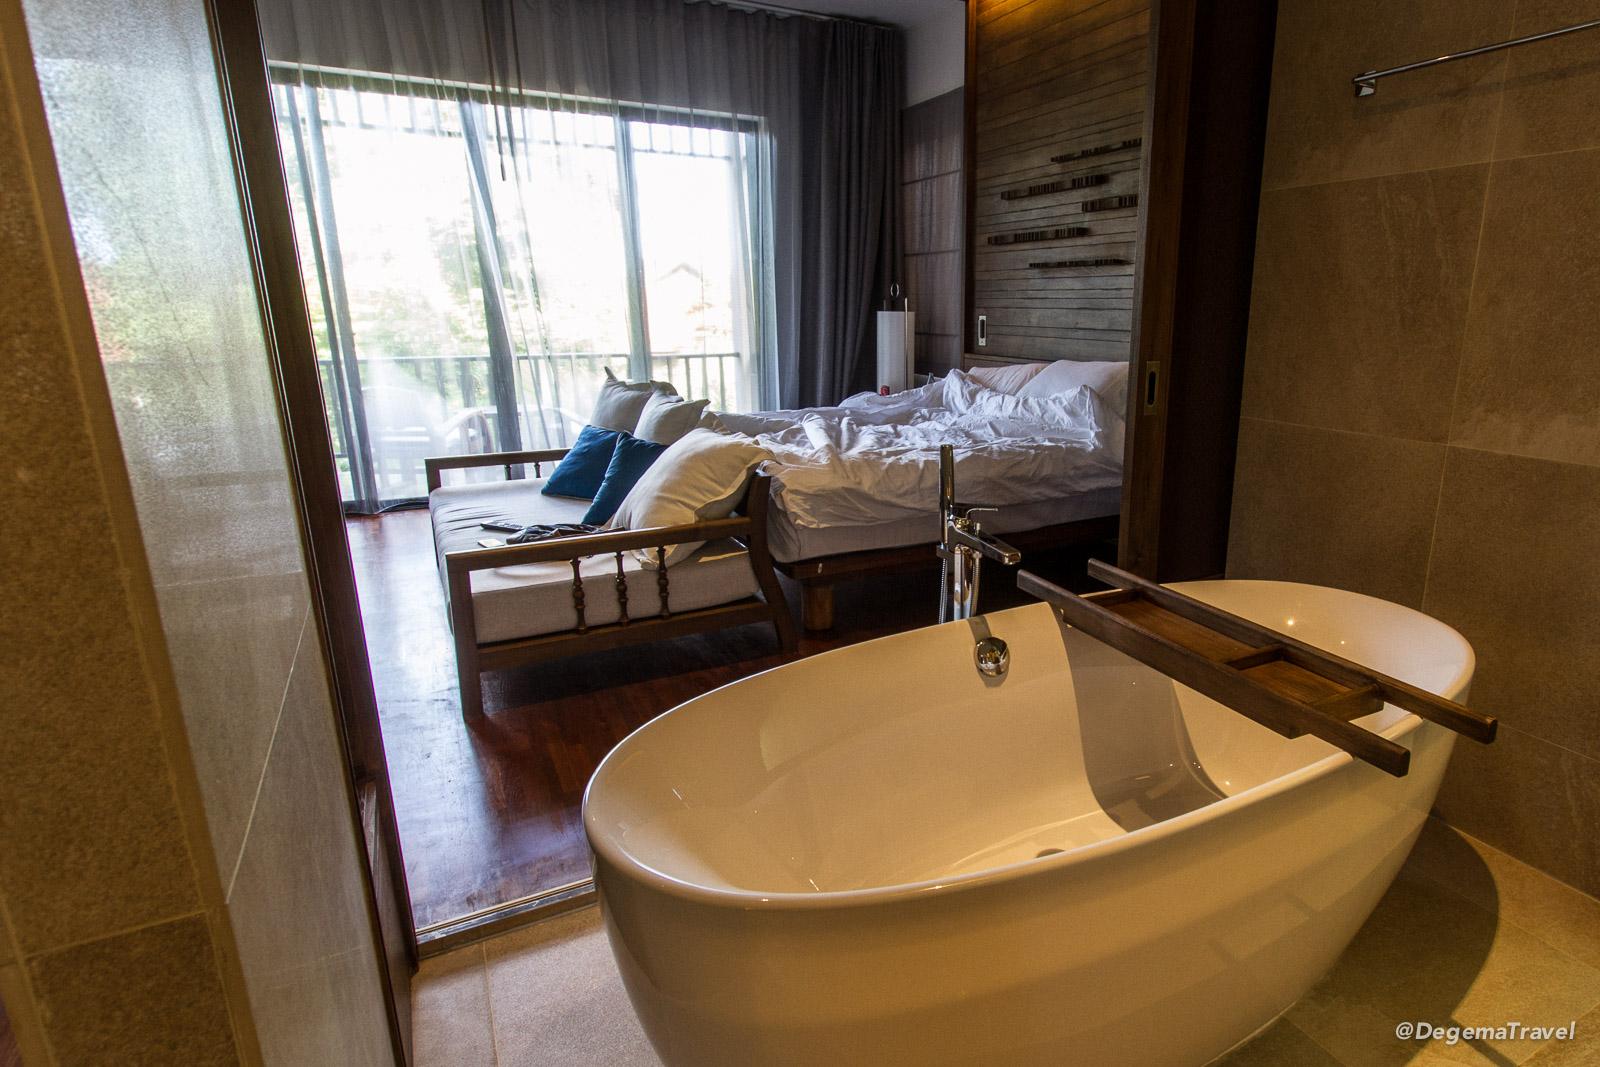 Room 201 at Pimalai Resort & Spa on Koh Lanta, Thailand